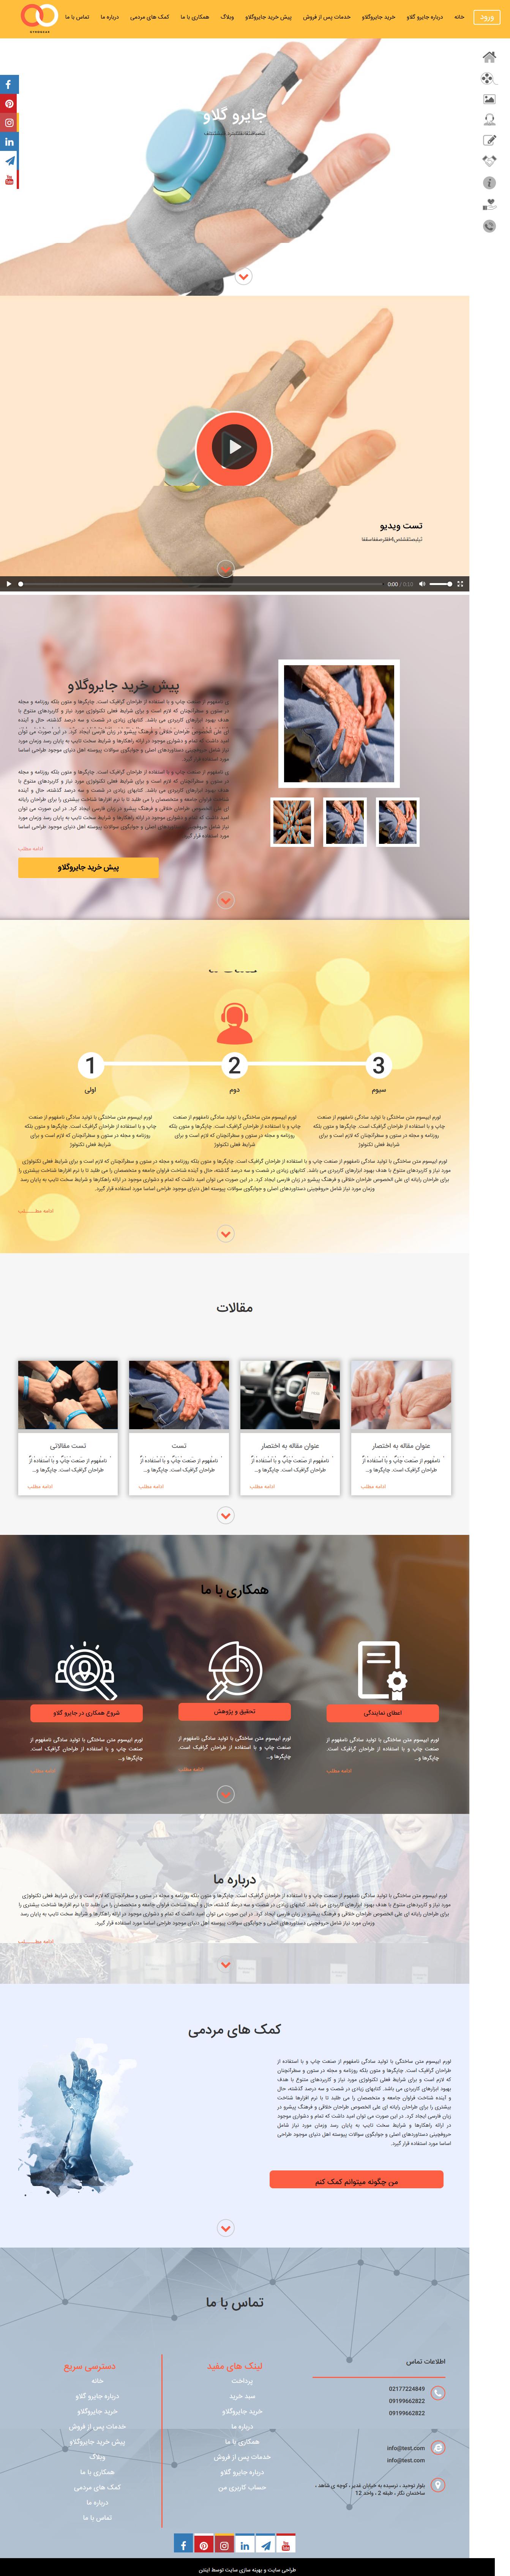 نمونه کار طراحی سایت جایرو